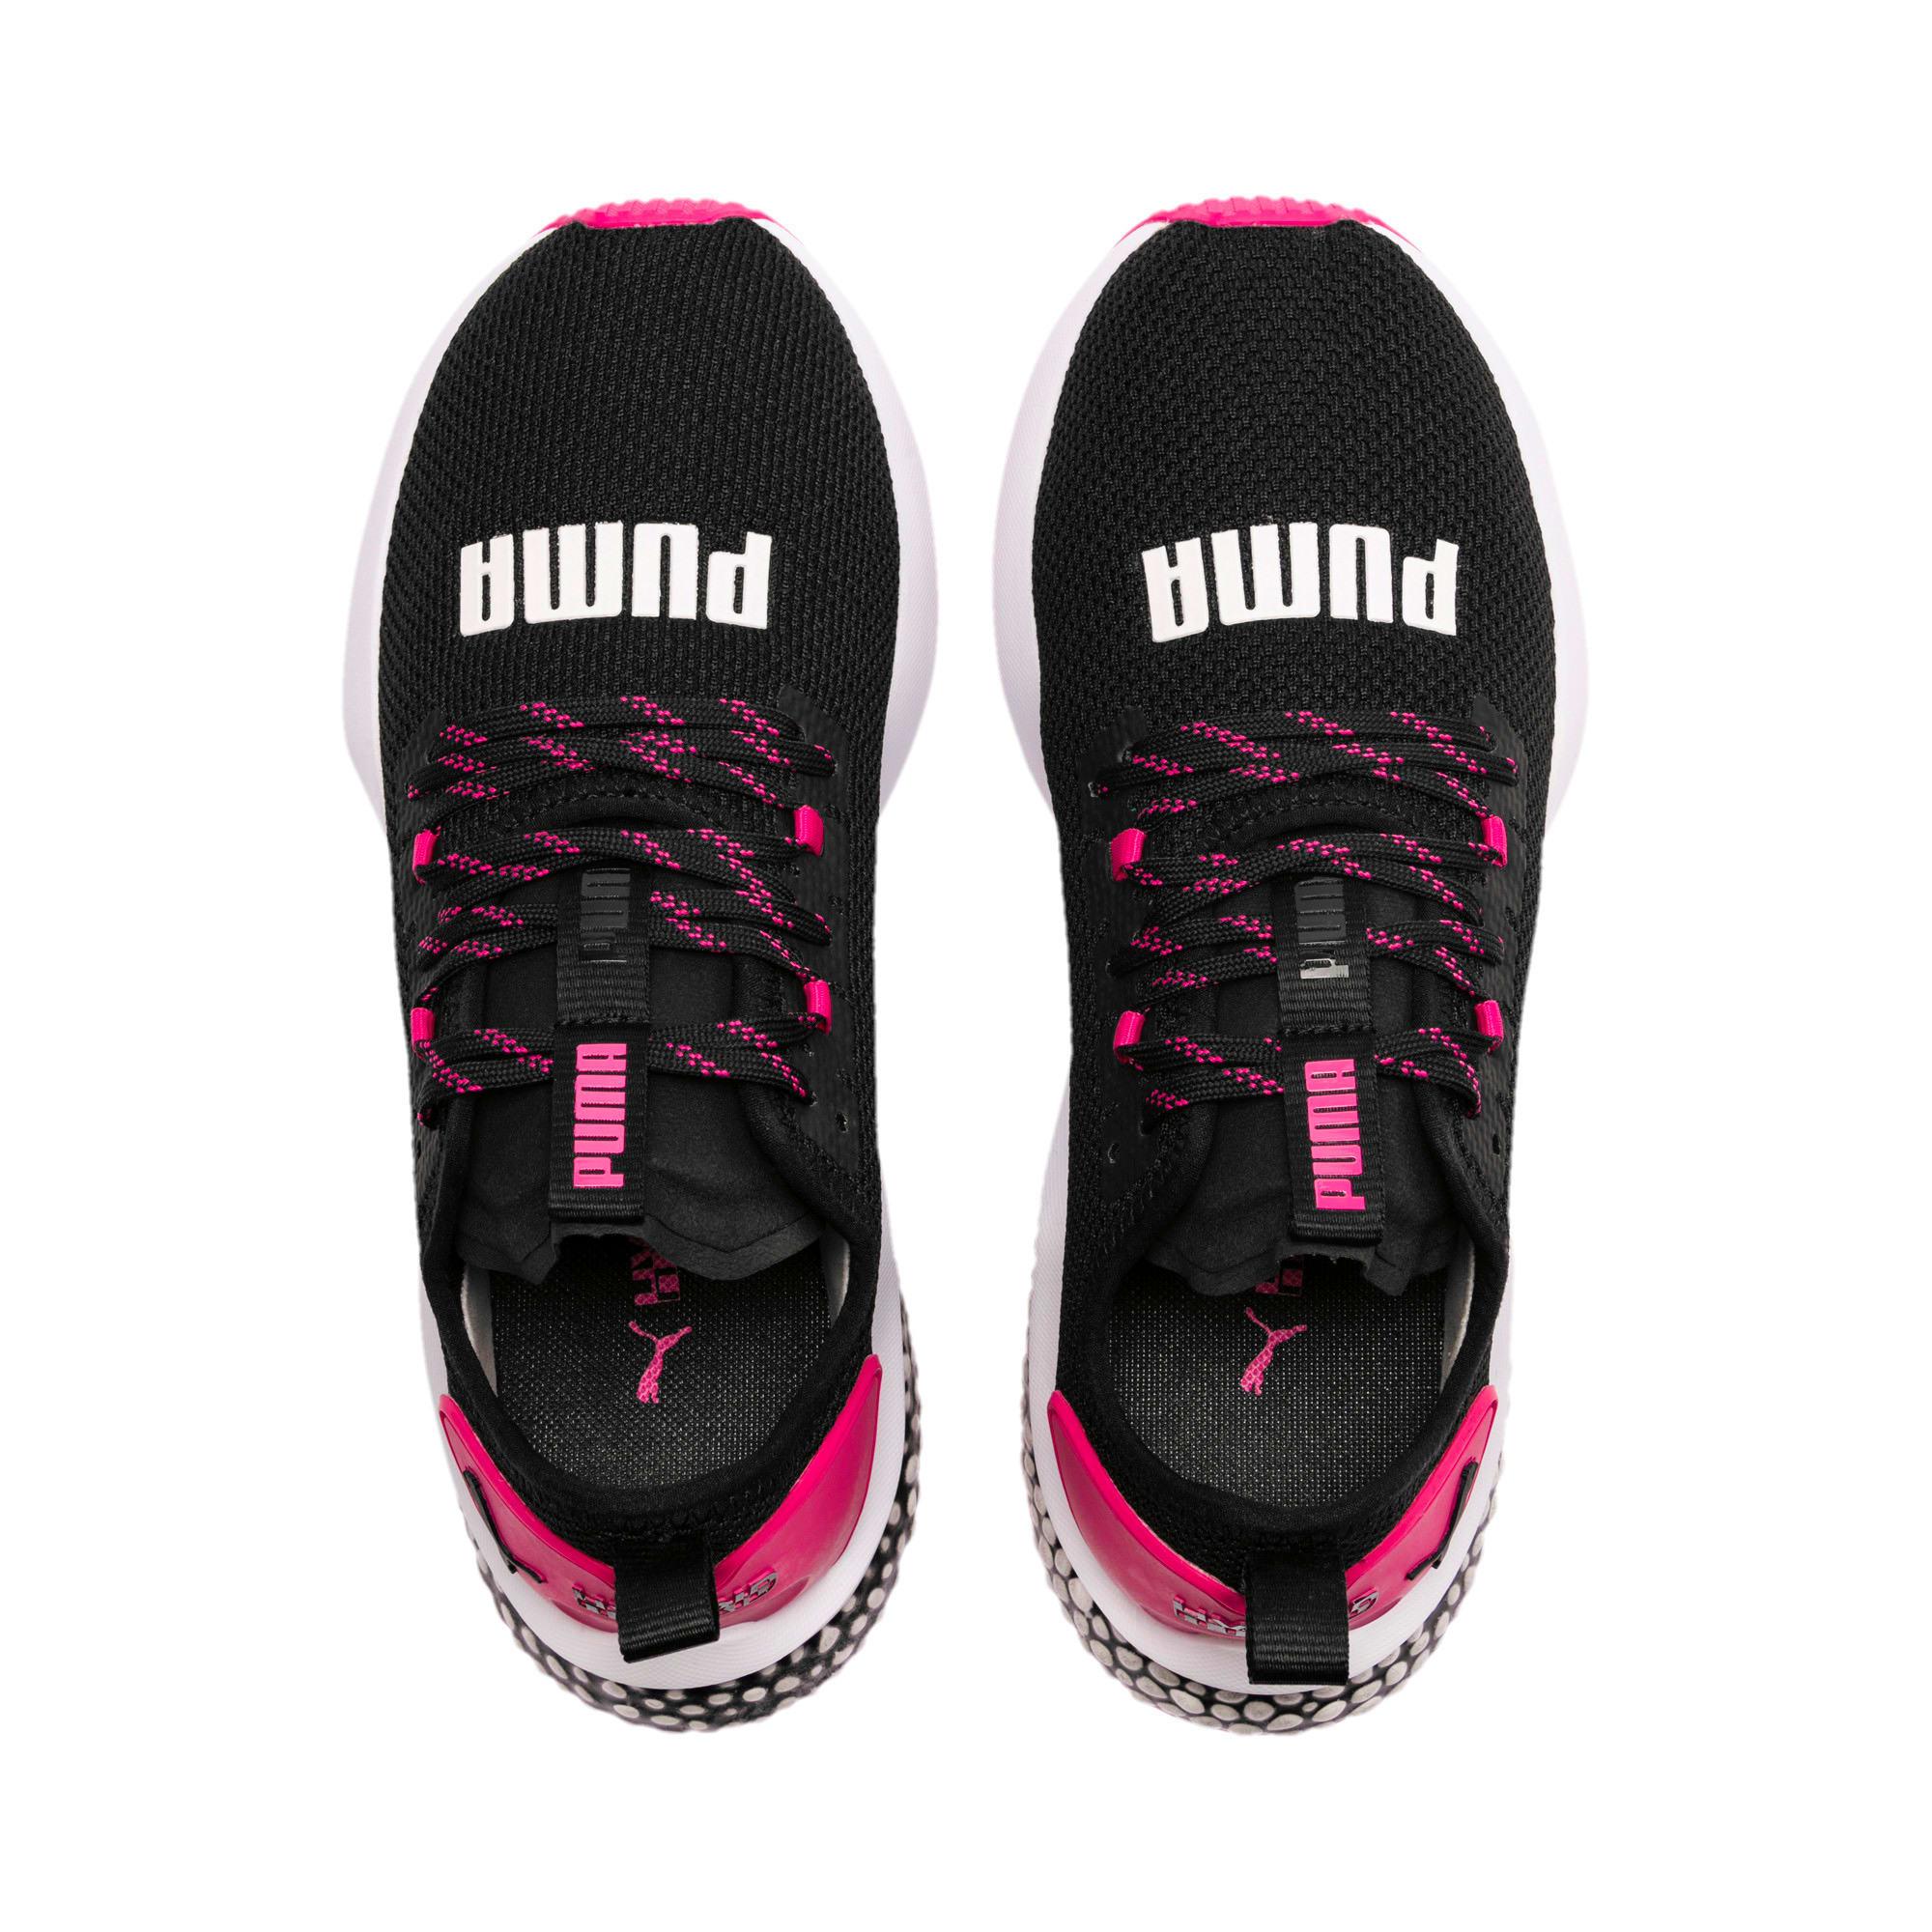 Thumbnail 7 of ハイブリッド NX ウィメンズ, Puma Black-Fuchsia Purple, medium-JPN